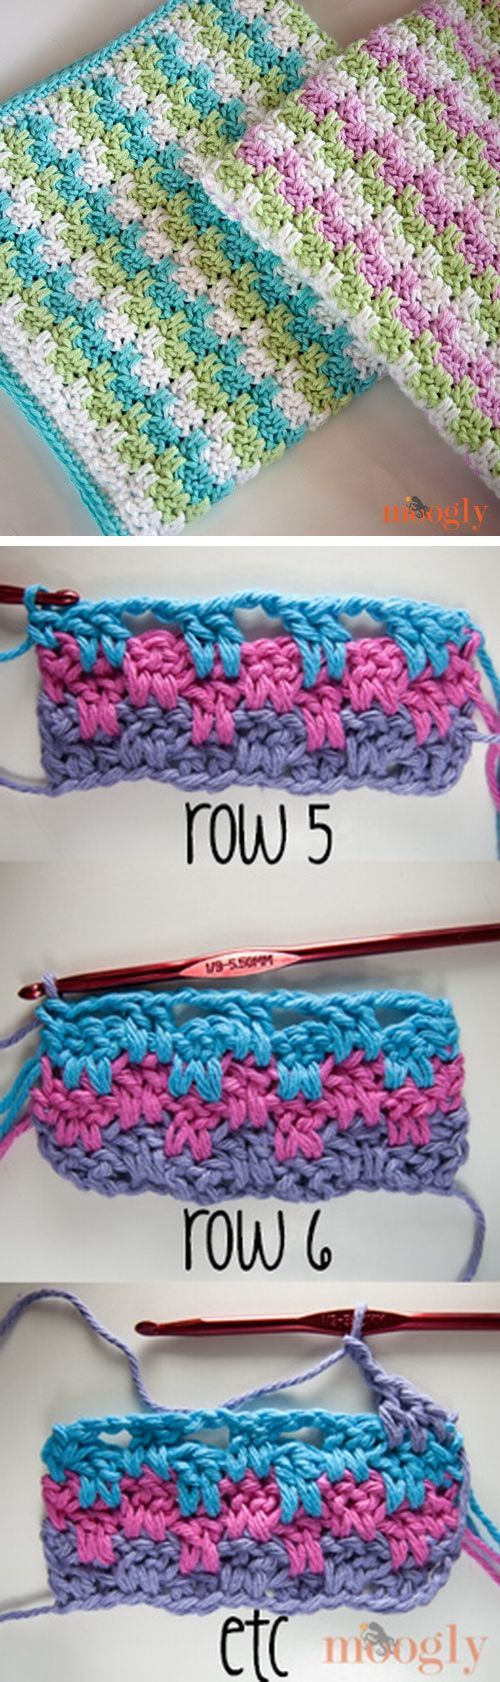 Free Crochet Pattern: Leaping Stripes and Blocks Blanket | einfache ...